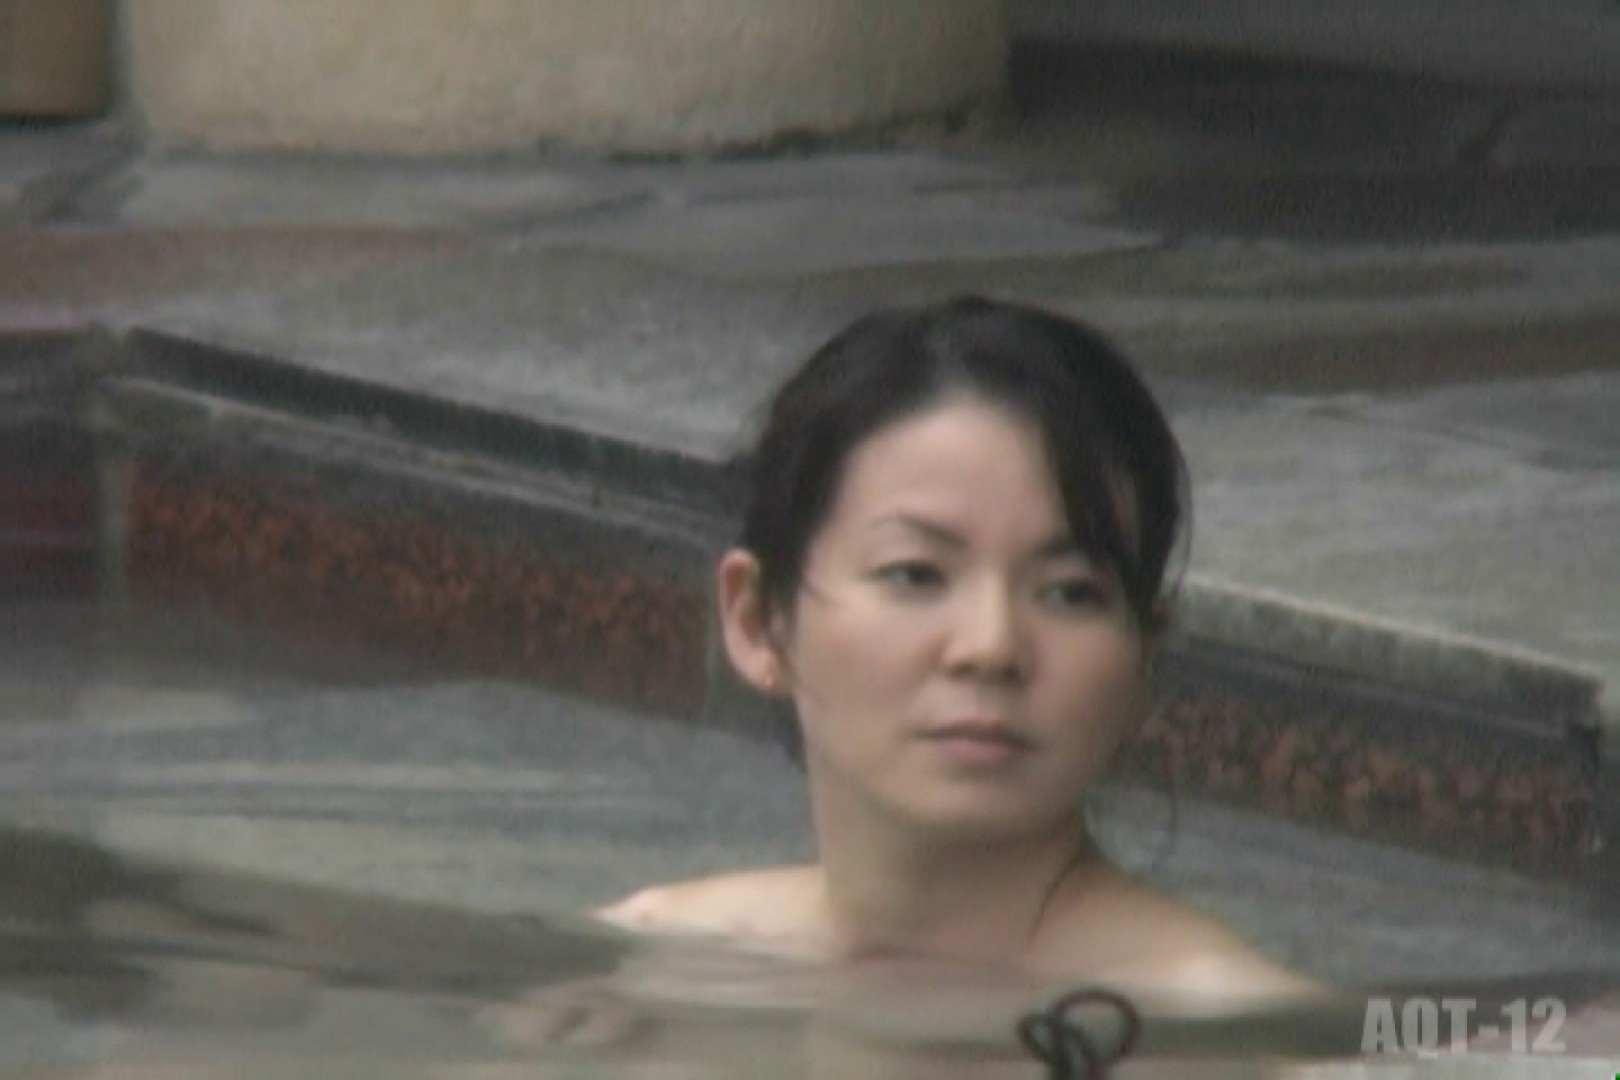 Aquaな露天風呂Vol.811 露天 | OLのプライベート  11pic 7